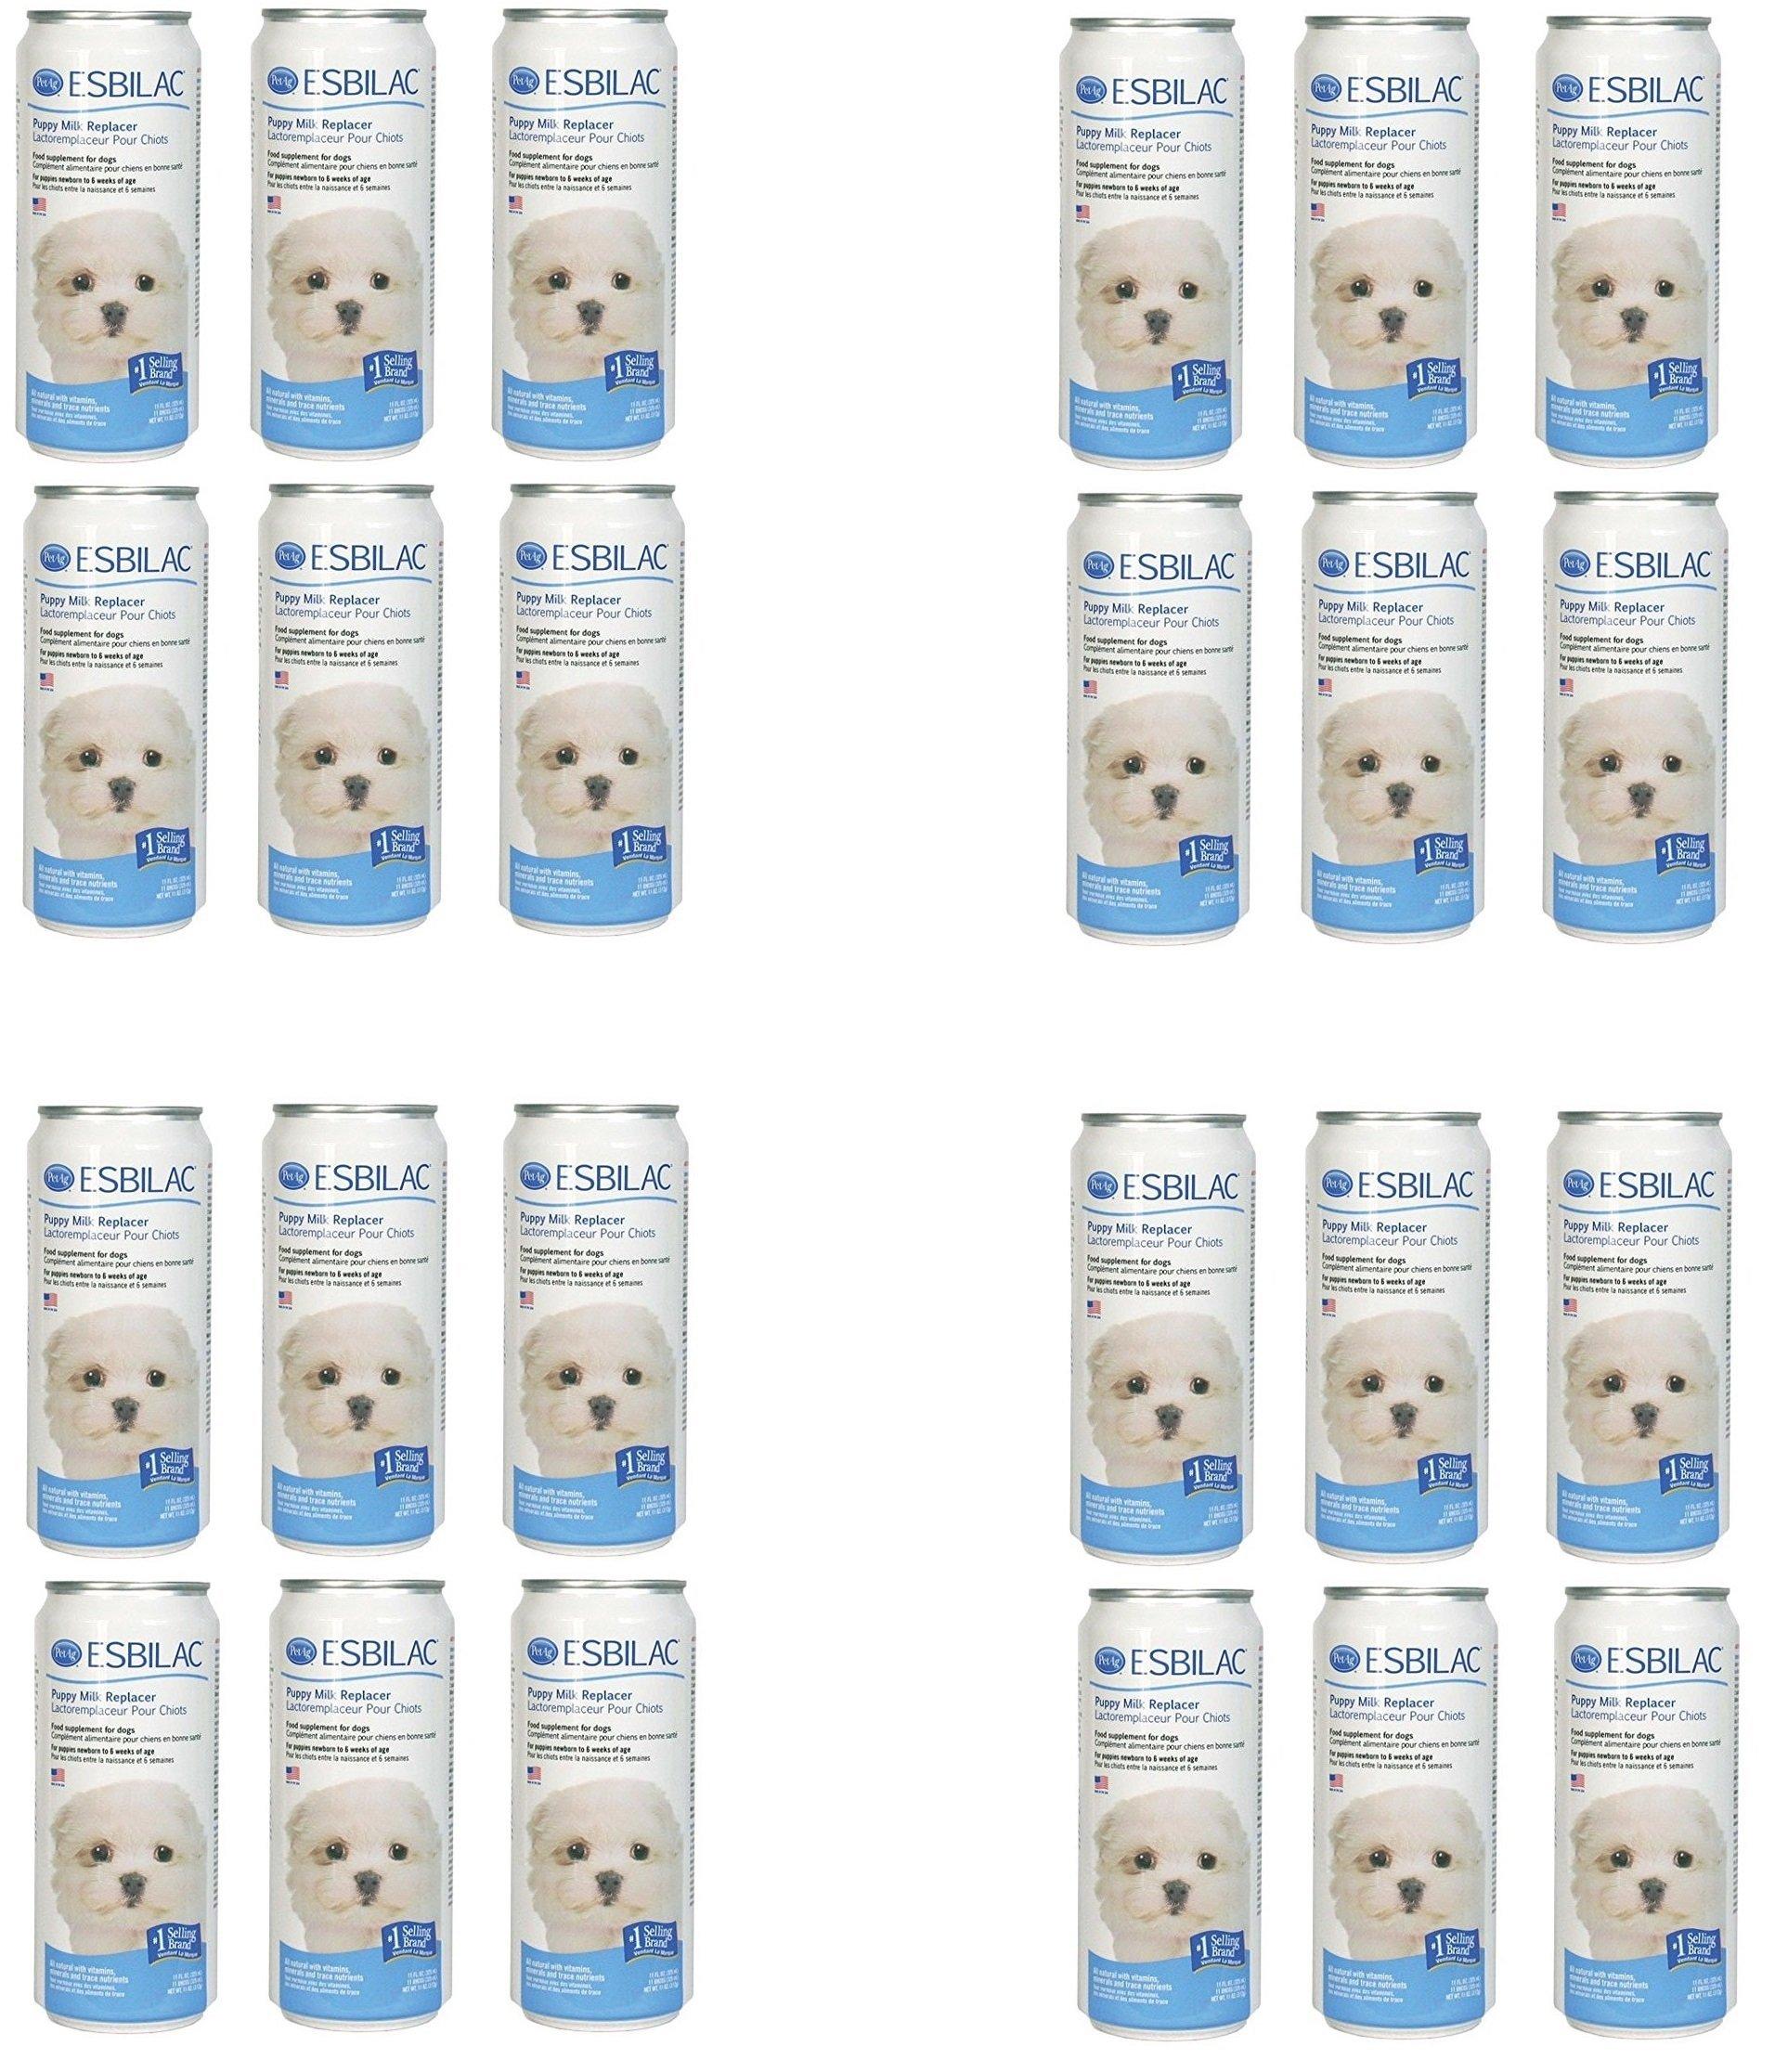 (Case of 24) Esbilac Liquid for Puppies, Milk Replacer - 11 Ounces each